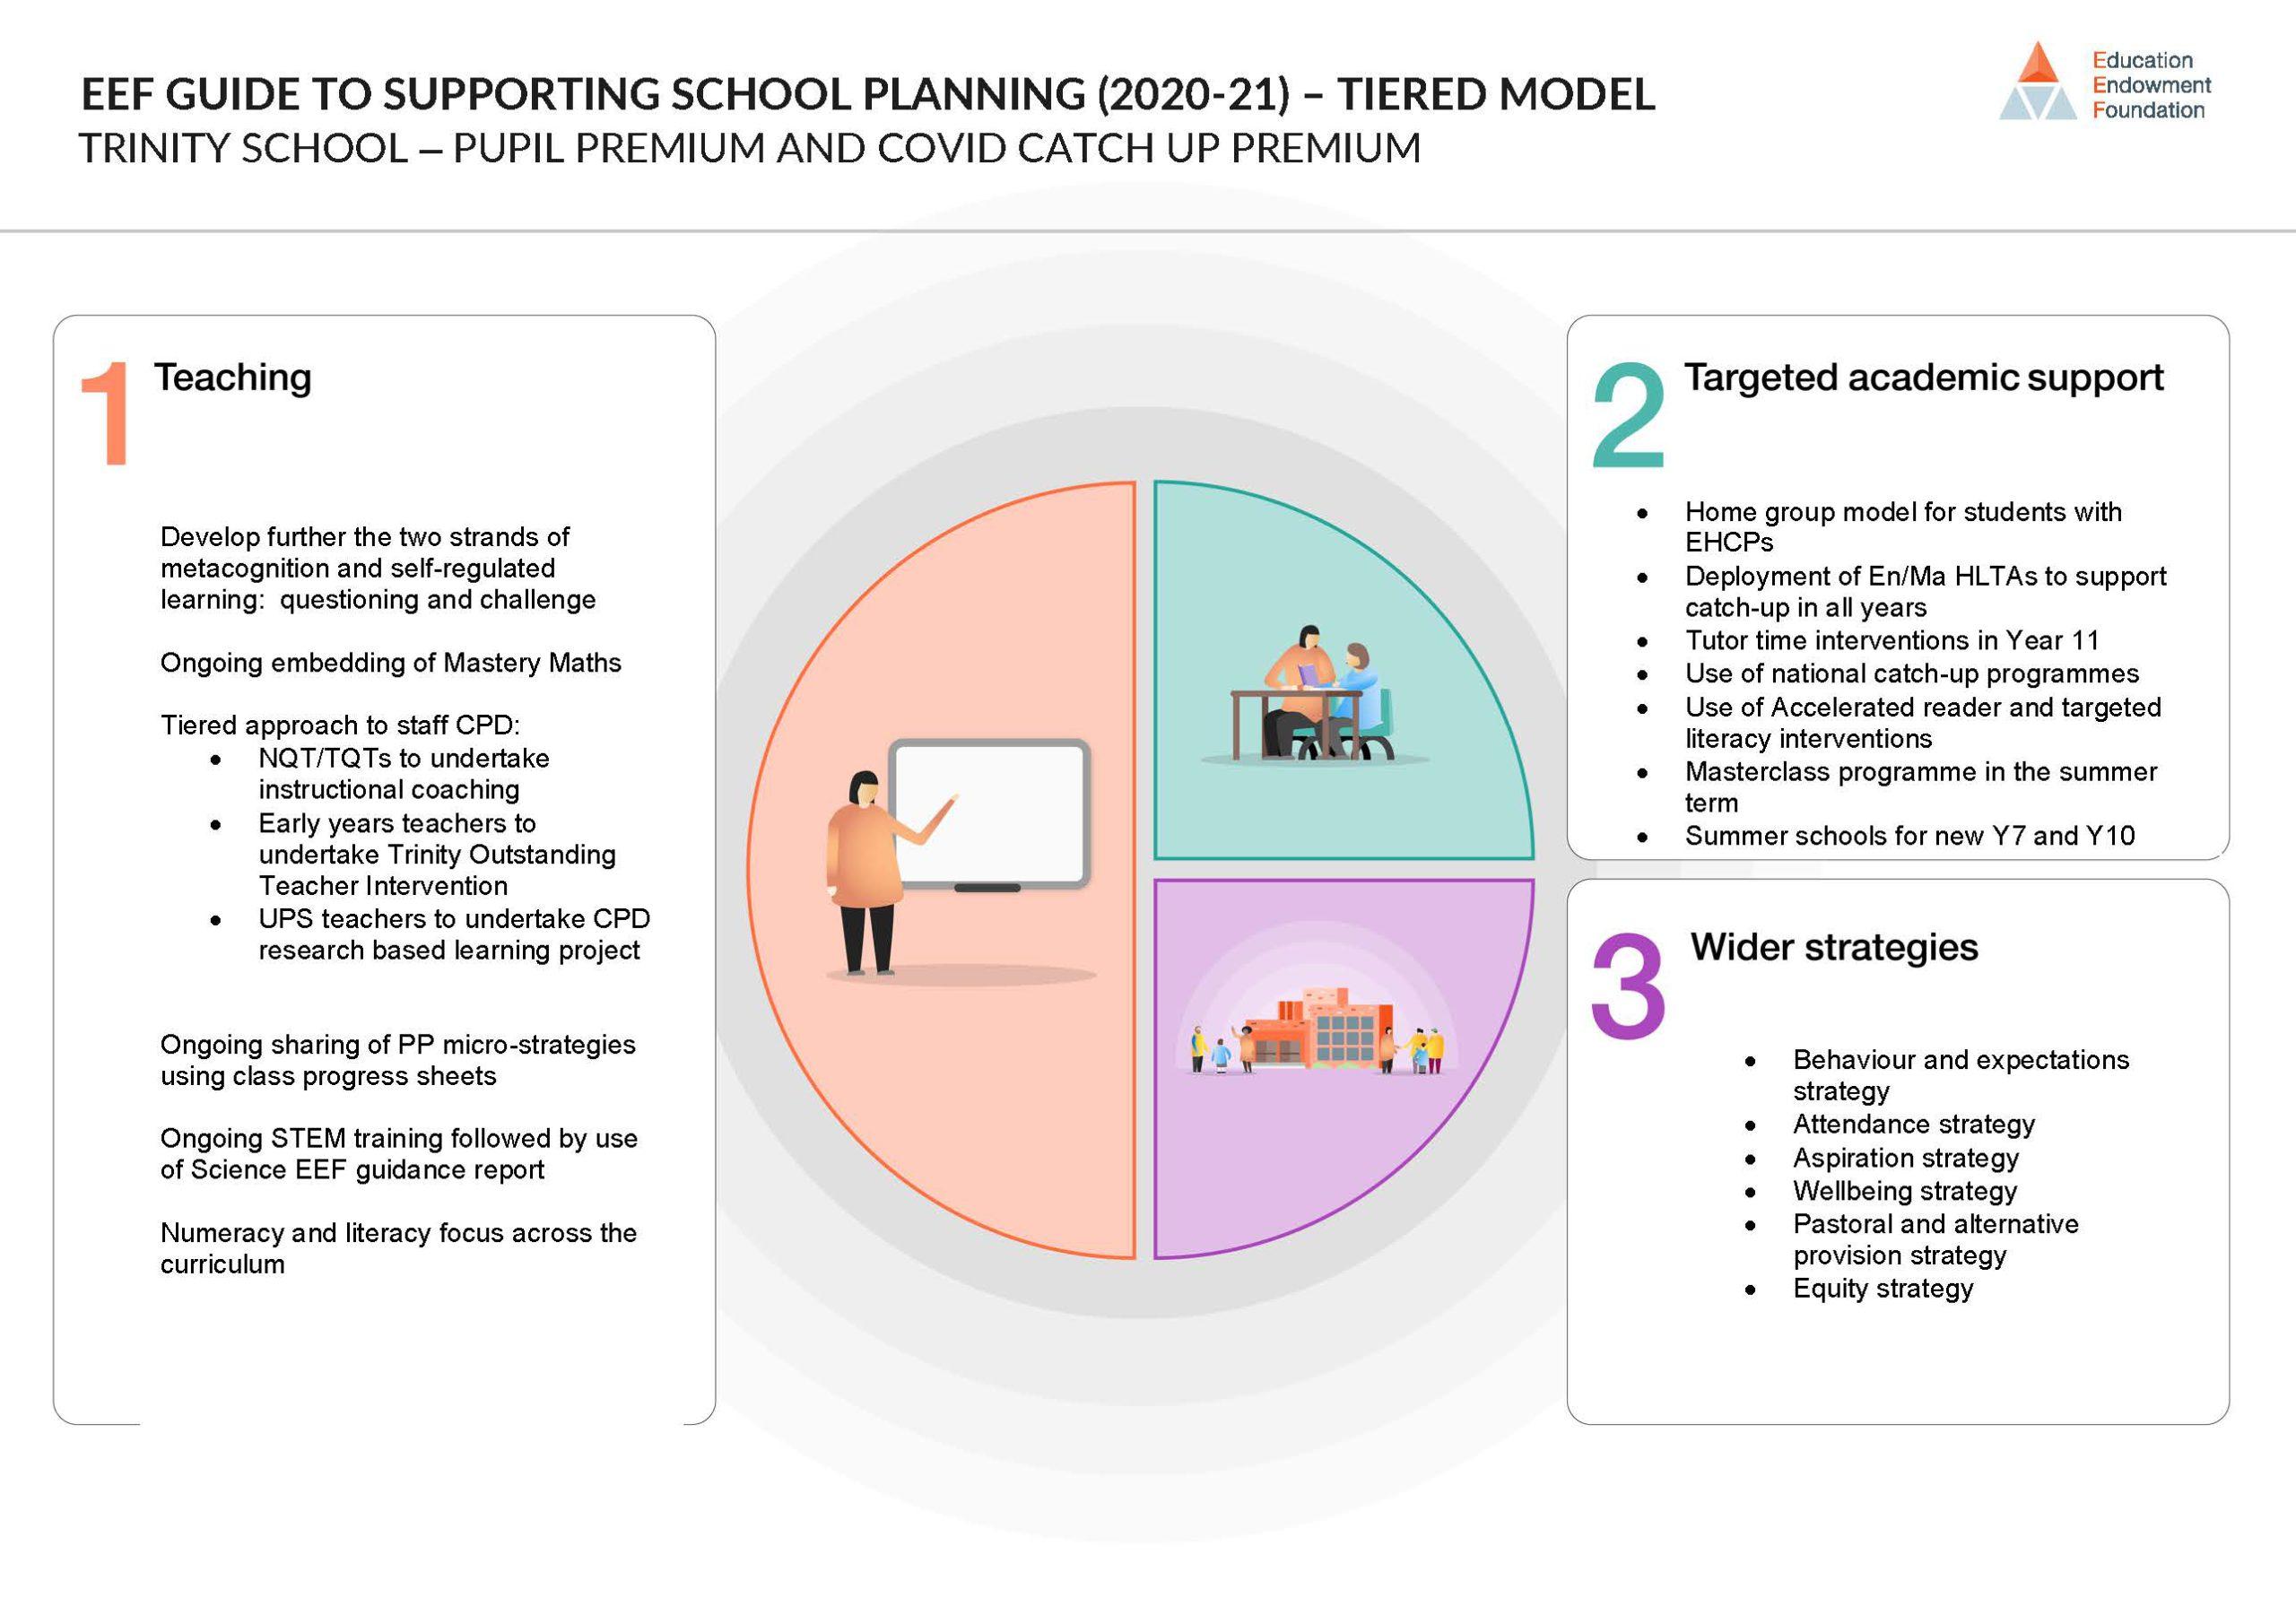 Trinity-School-Pupil-Premium-Planning-Document-2020-to-2021-1